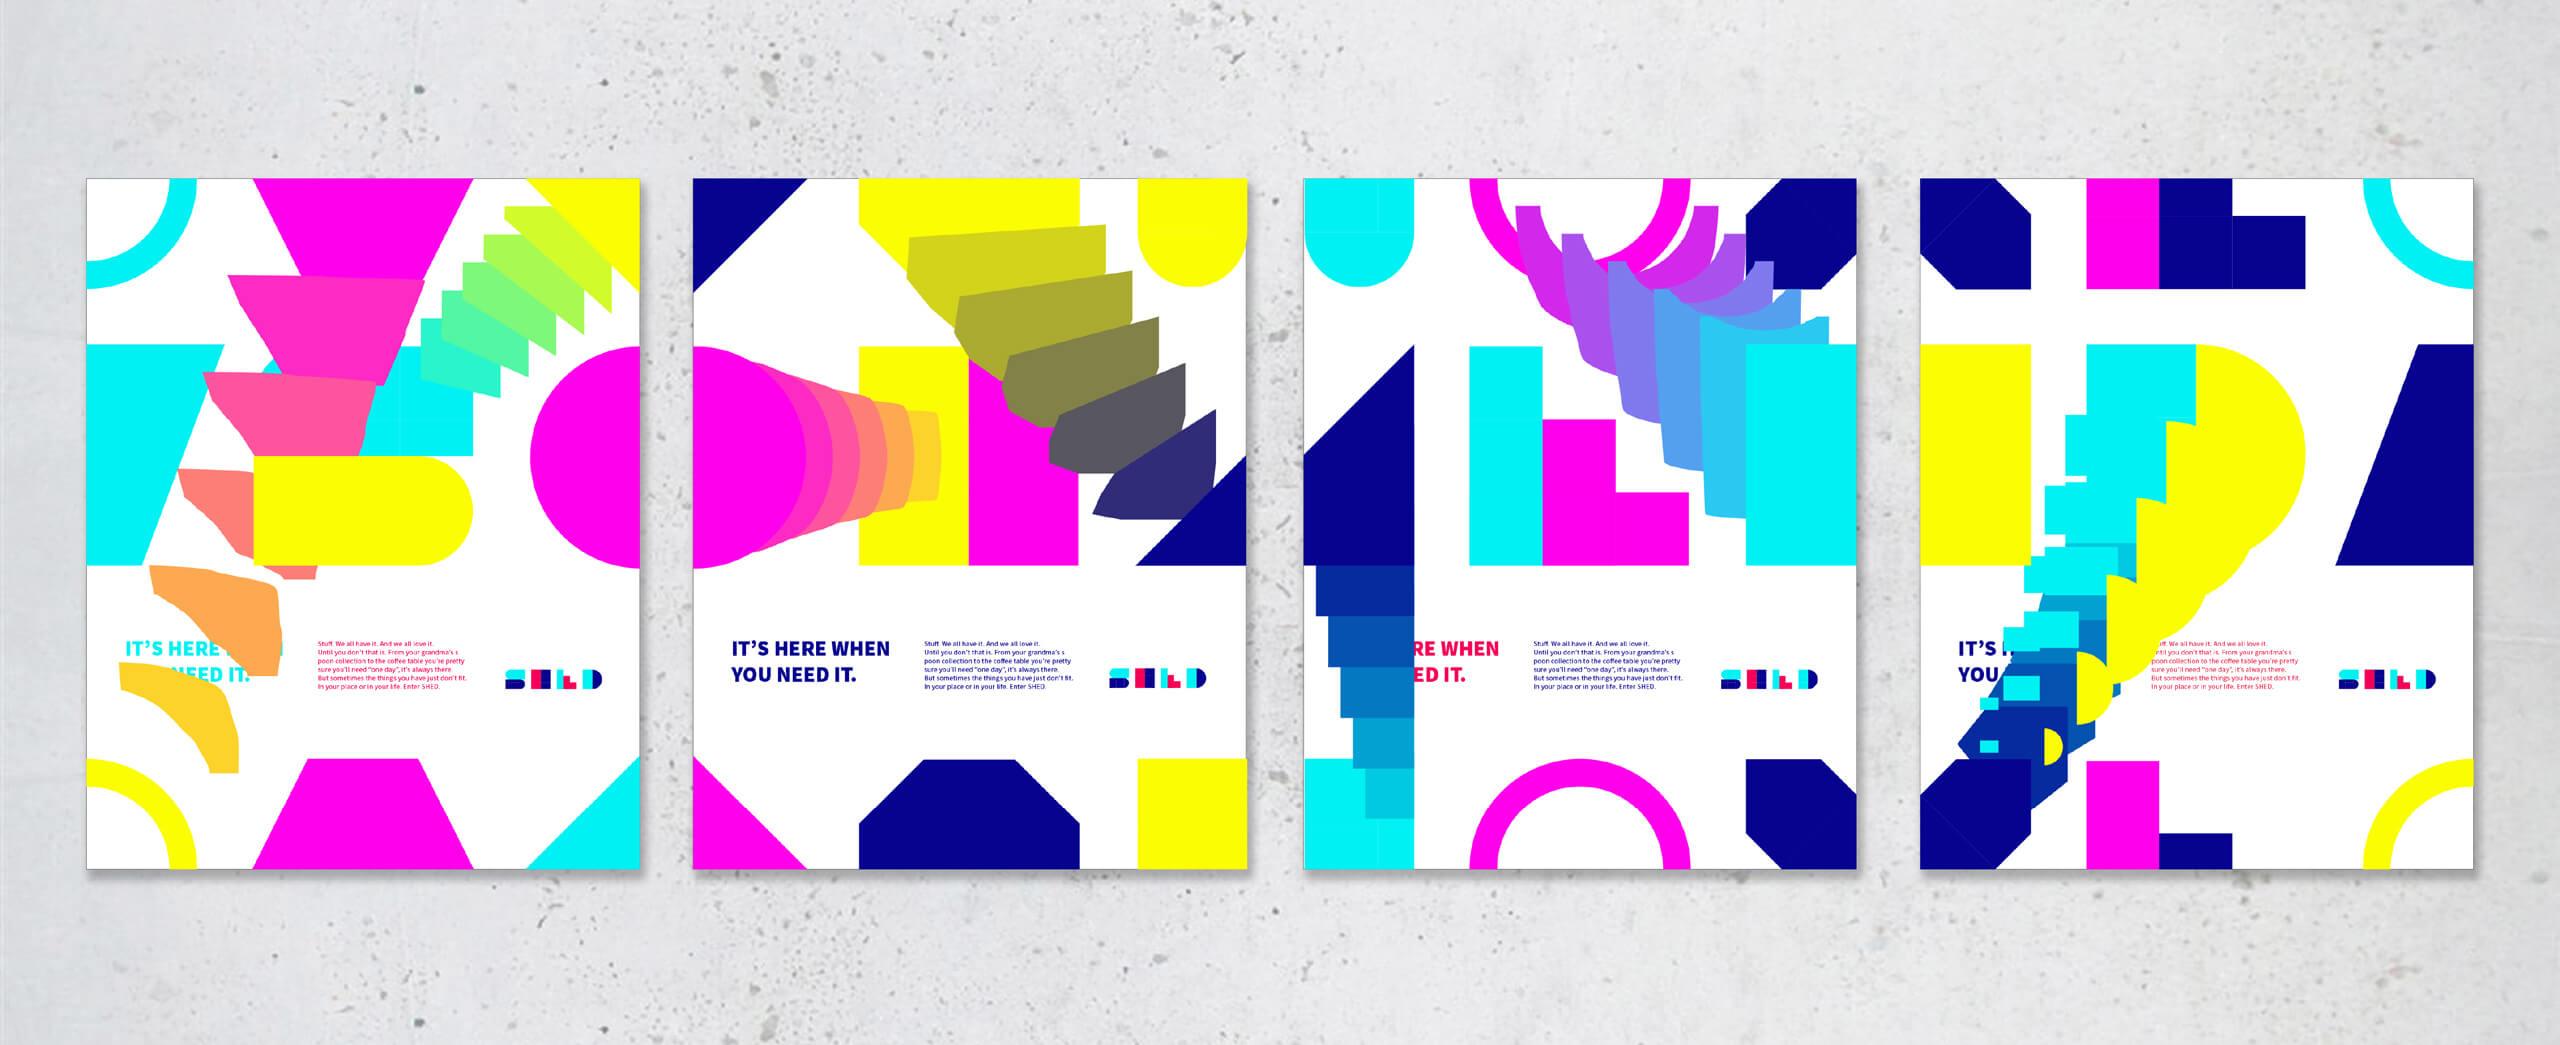 SHED-Dynamic-Poster-Designs-concept_MR